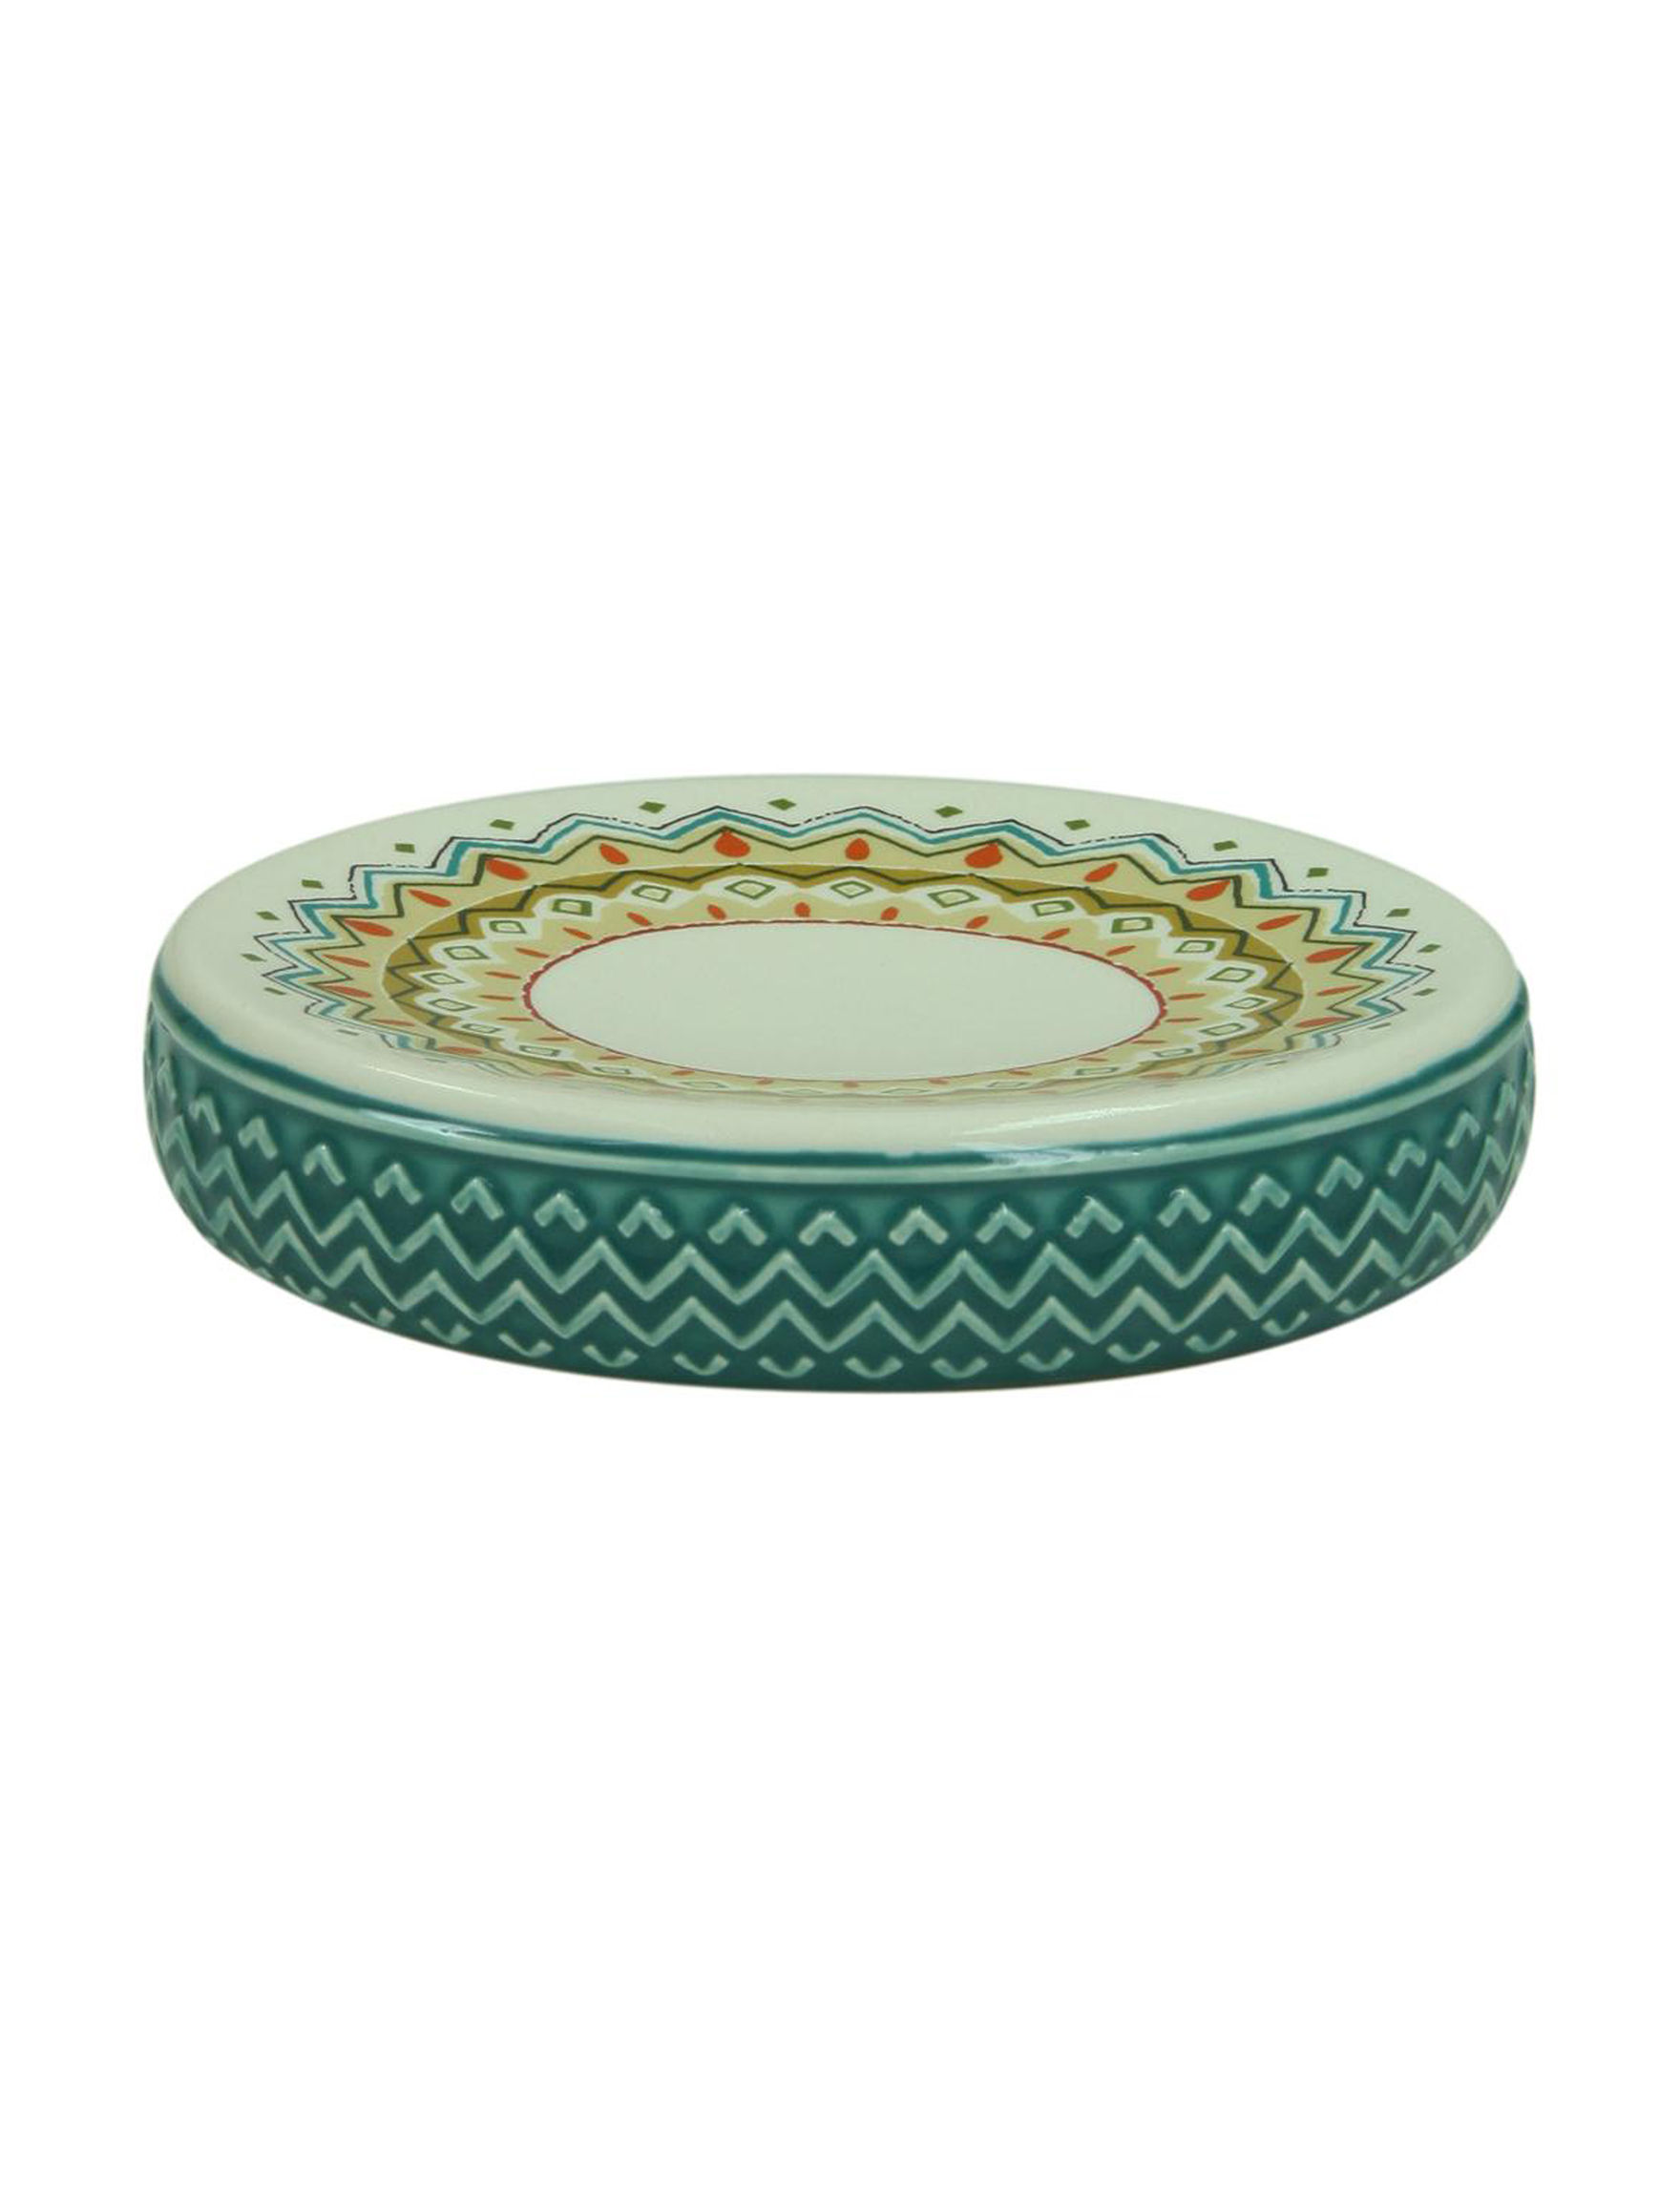 Bacova Guild Ivory Soap Dishes Bath Accessories